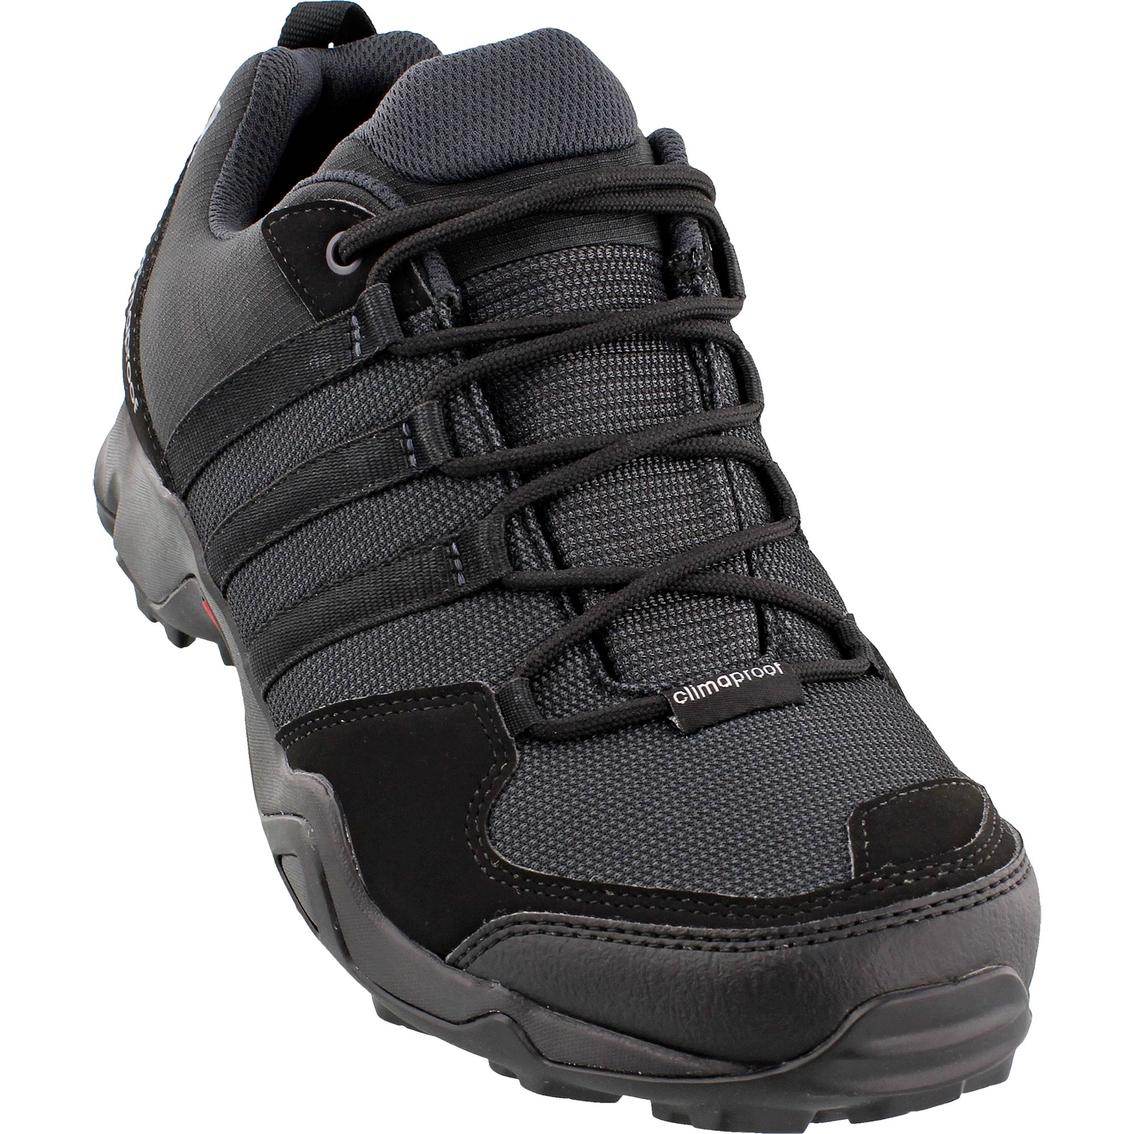 216bae09b255 Adidas Outdoor Men s Ax2 Cp Hiking Shoes